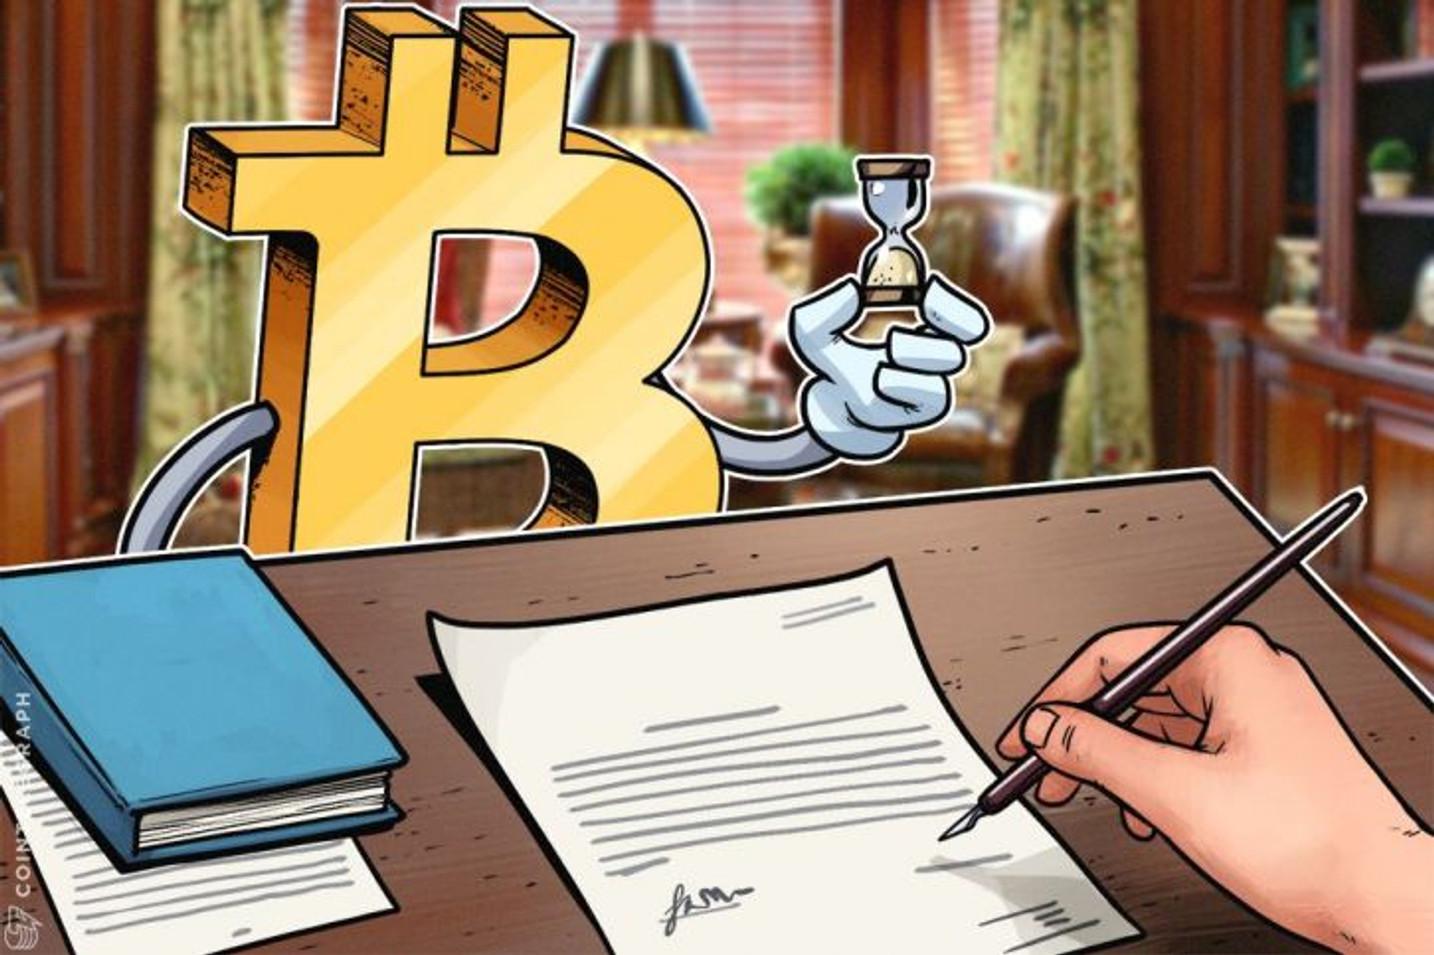 USA: Krypto-Handelsplattformen benötigen künftig Lizenz der Börsenaufsicht SEC